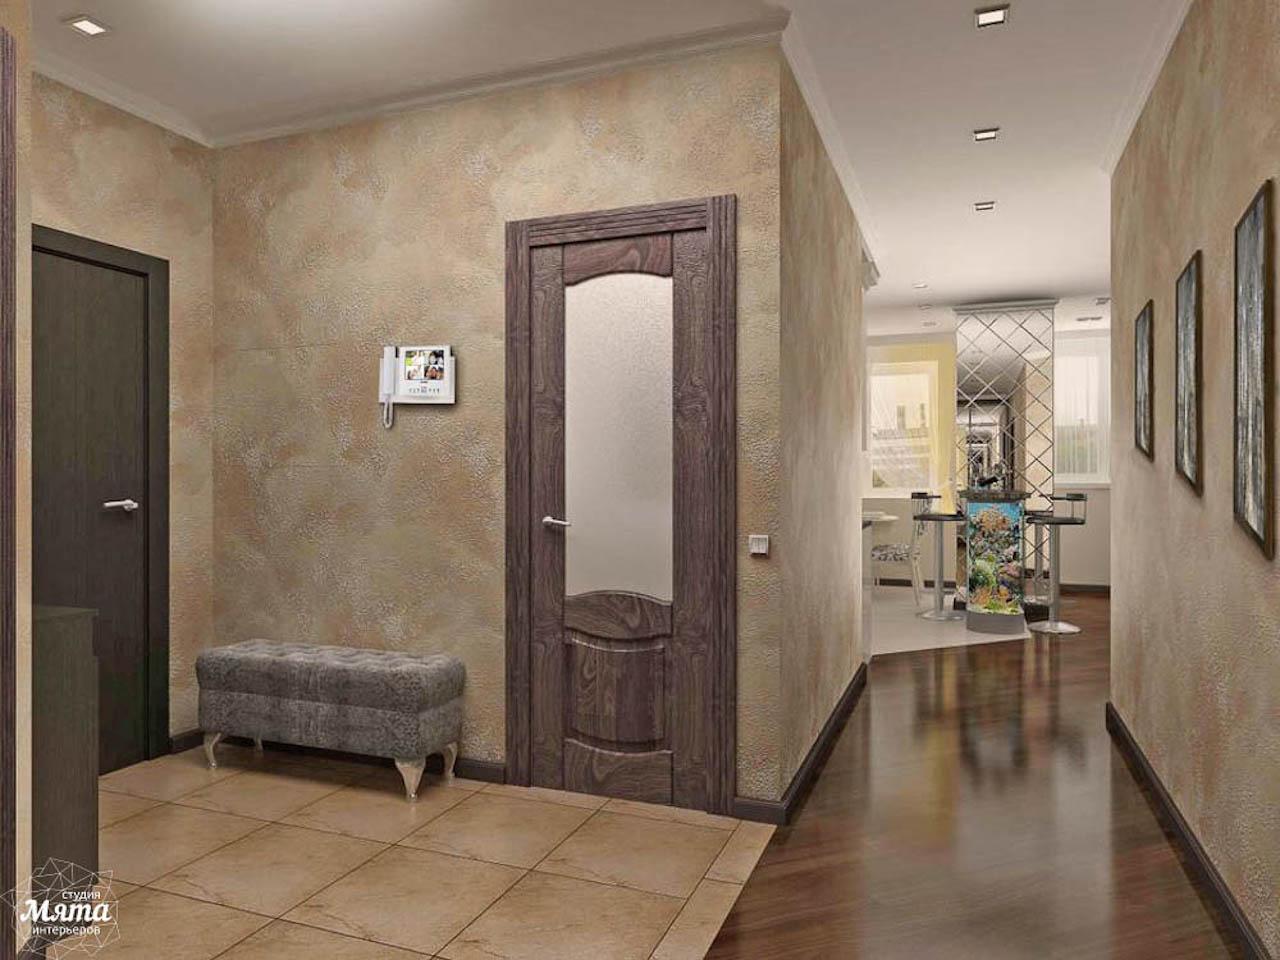 Дизайн интерьера двухкомнатной квартиры по ул. Юмашева 10 img2104362839